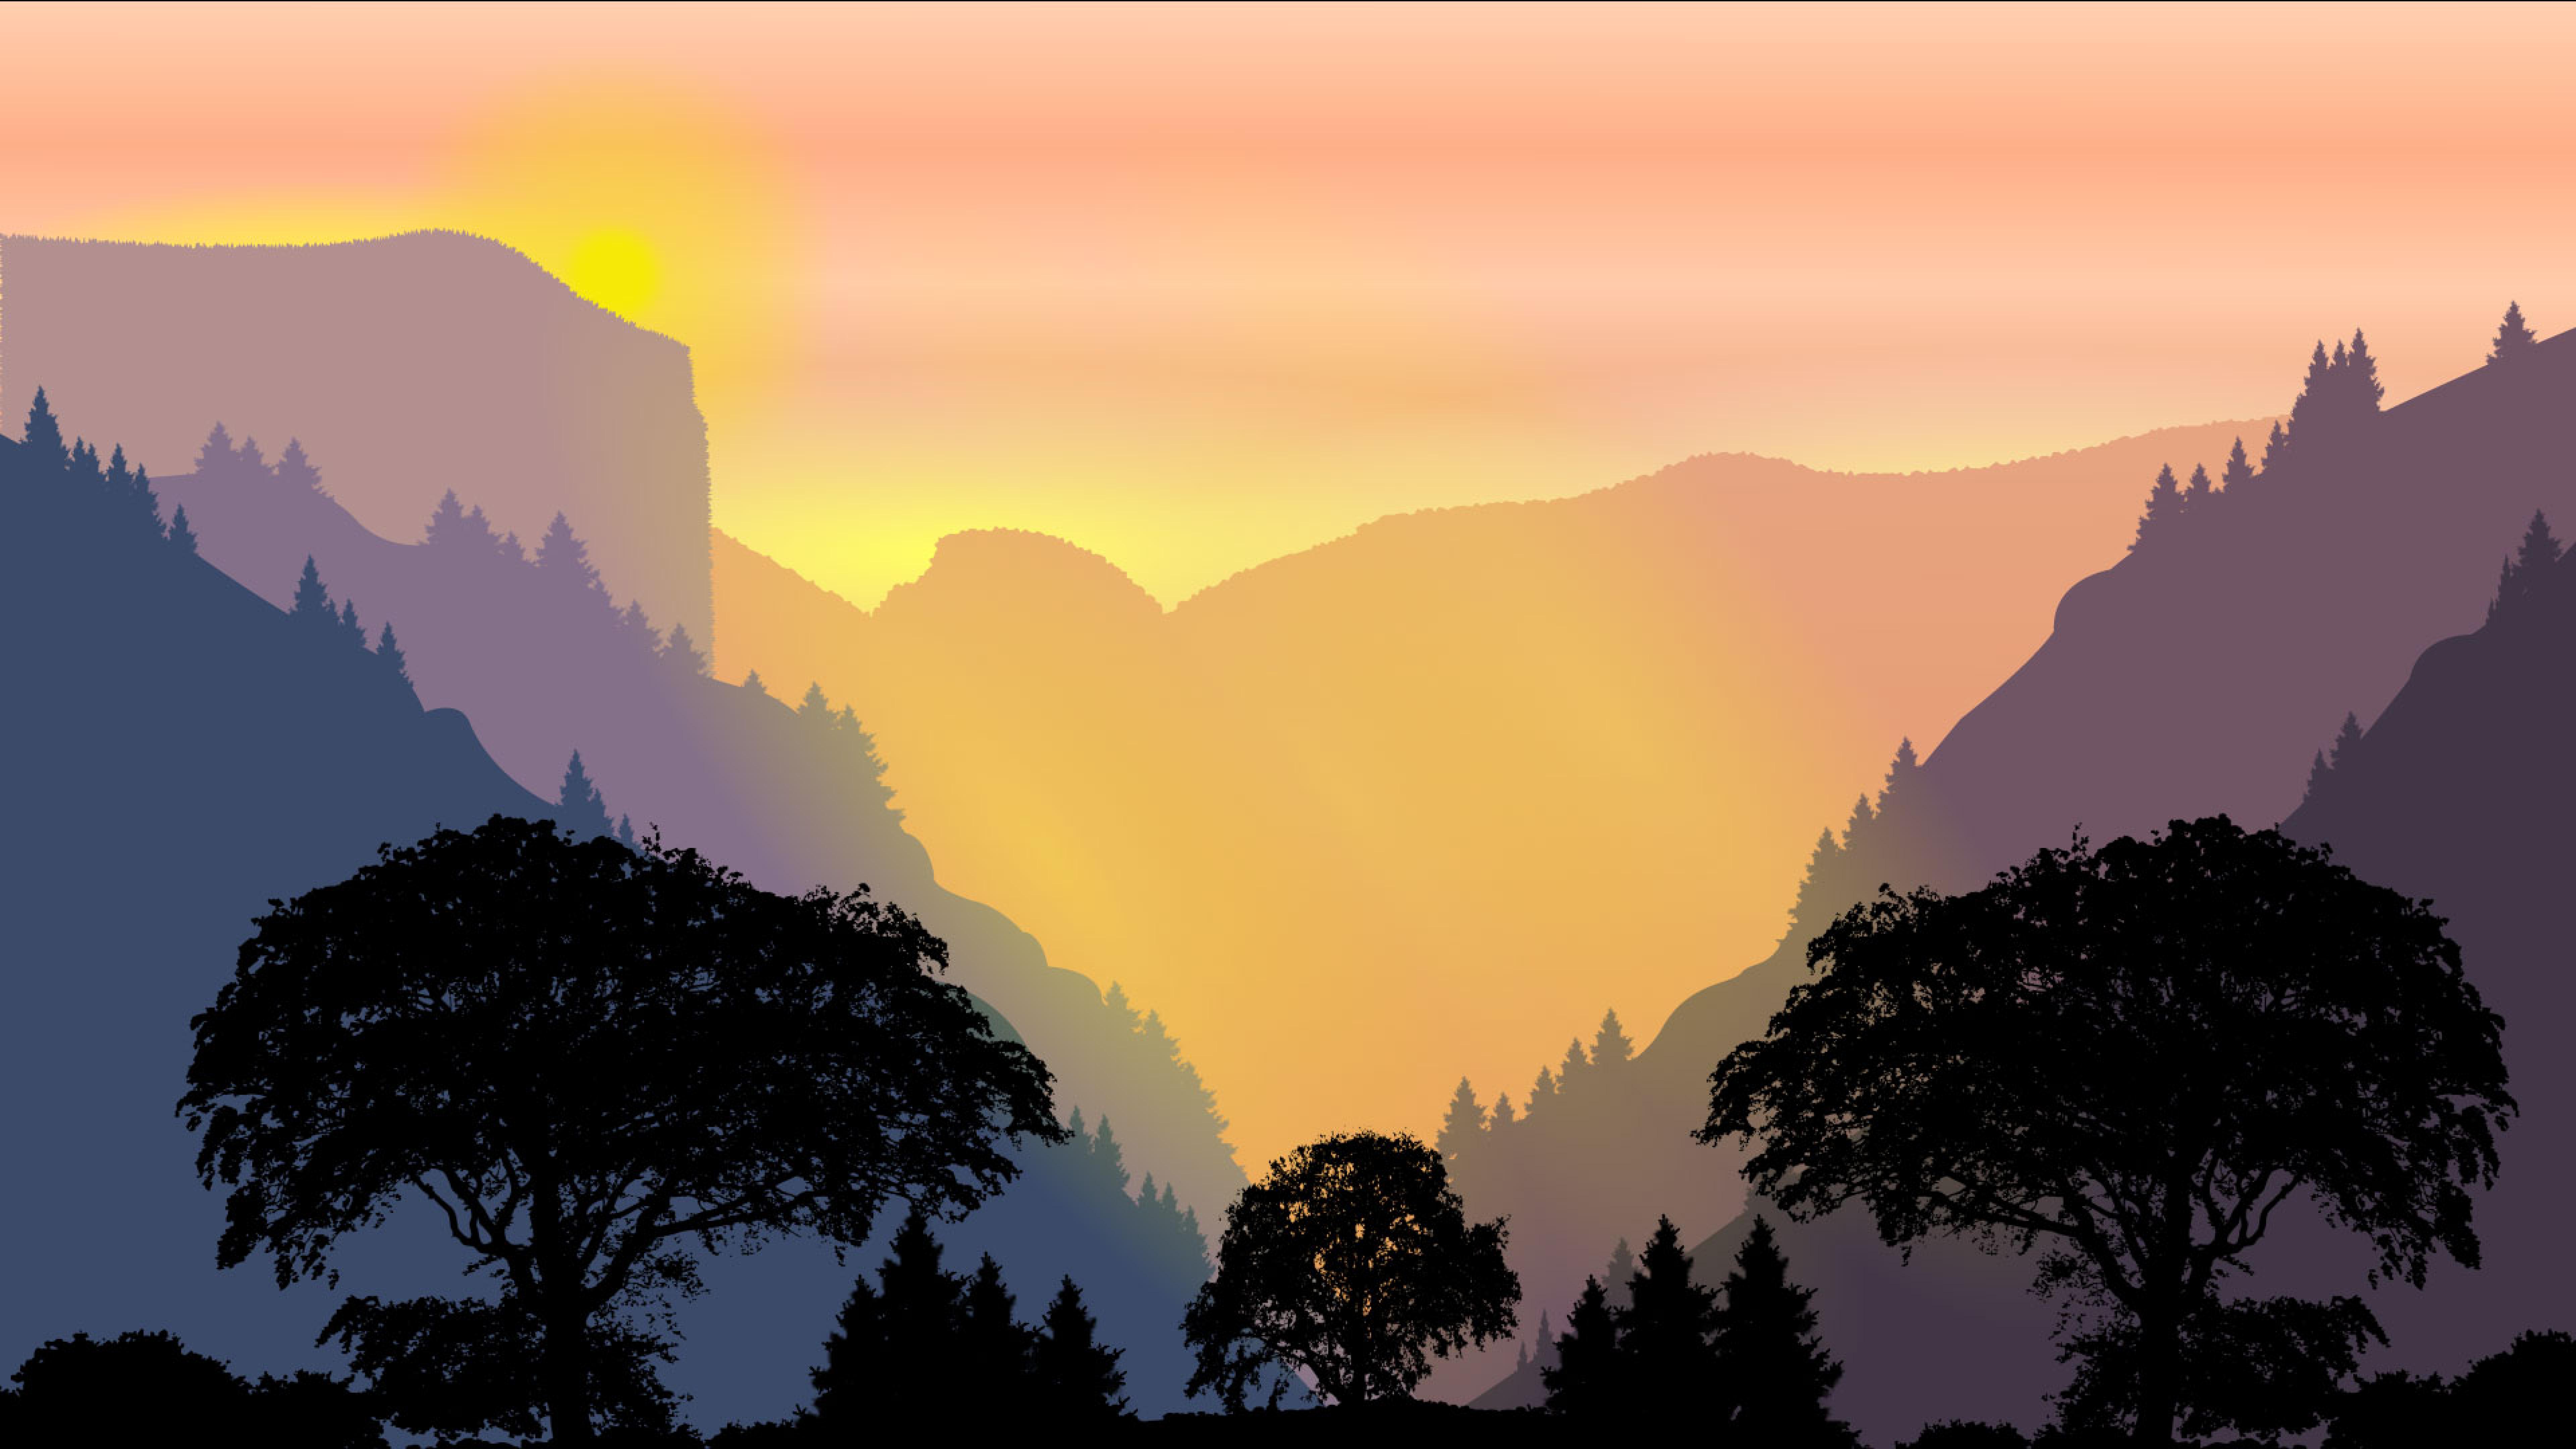 Forest minimal paint artwork full hd wallpaper - 8k minimal wallpaper ...